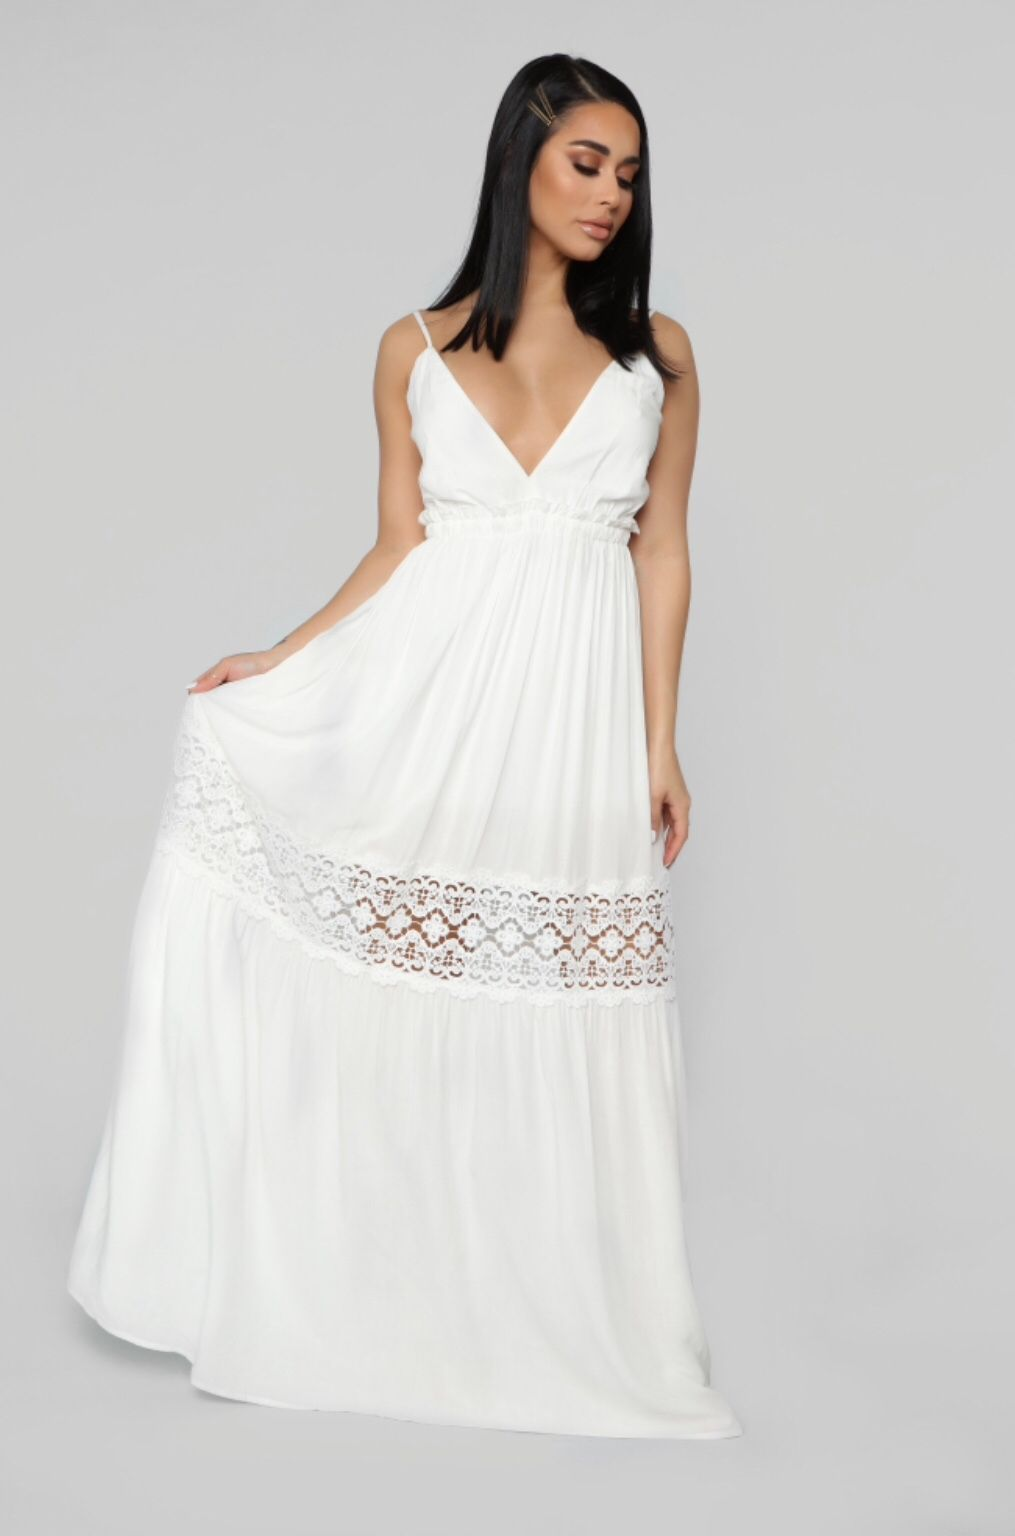 35cb8c503 I Got Your Back Maxi Dress - White in 2019 | Stephens rao | White ...